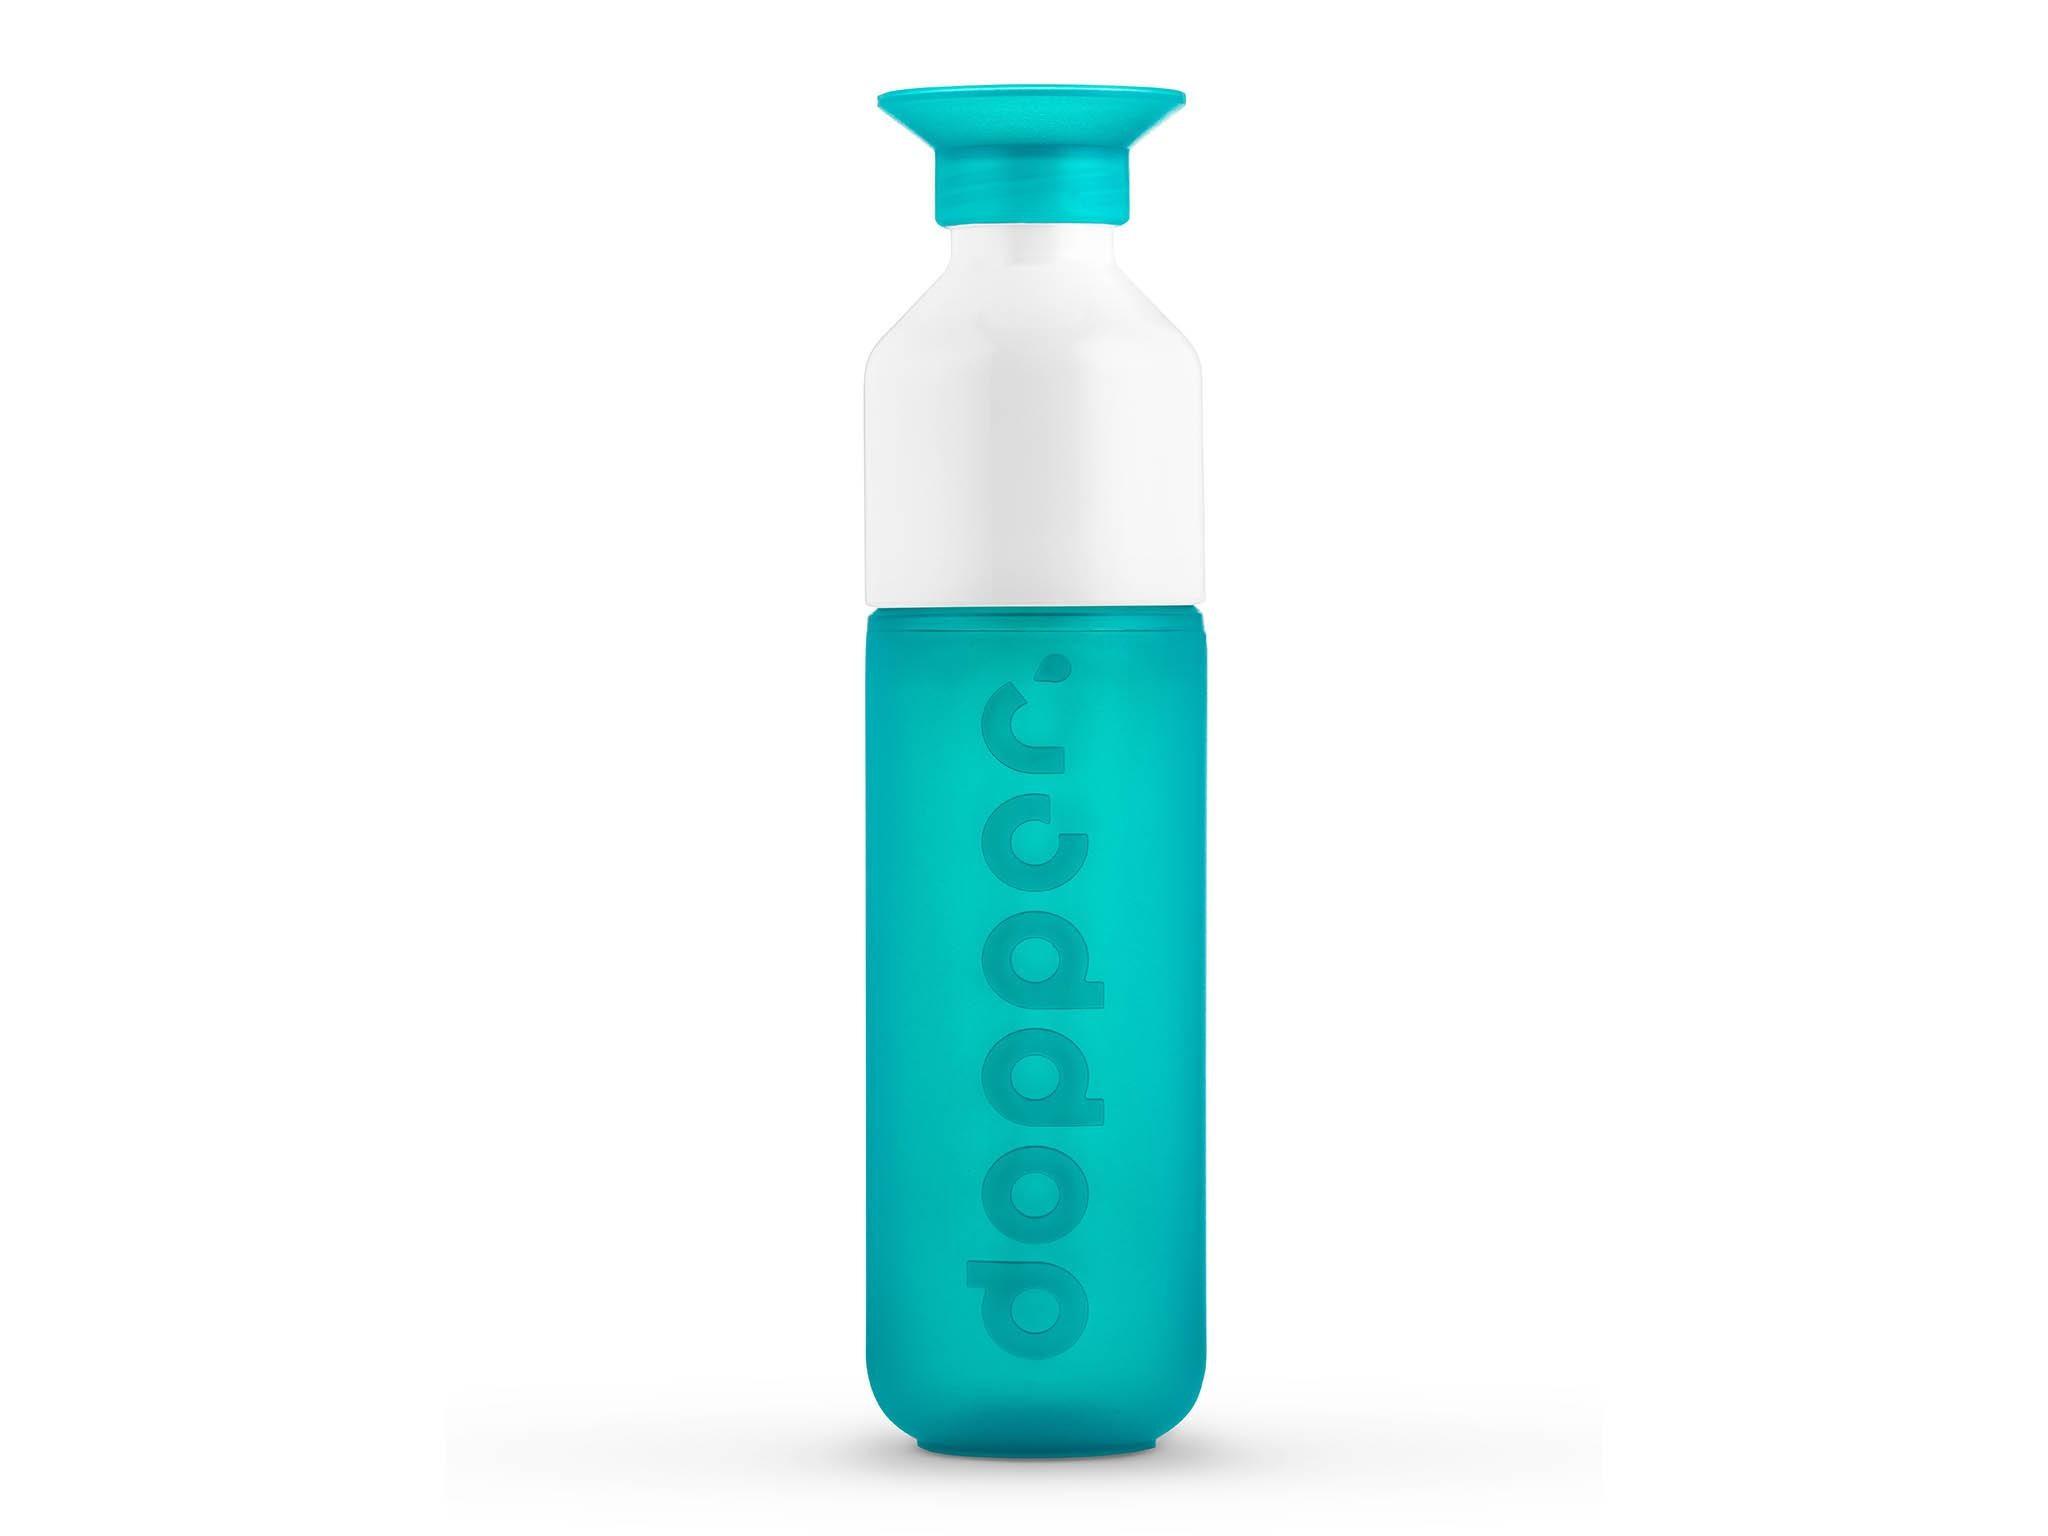 Best Reusable Water Bottle Bpa Free Drinking Bottles Guide